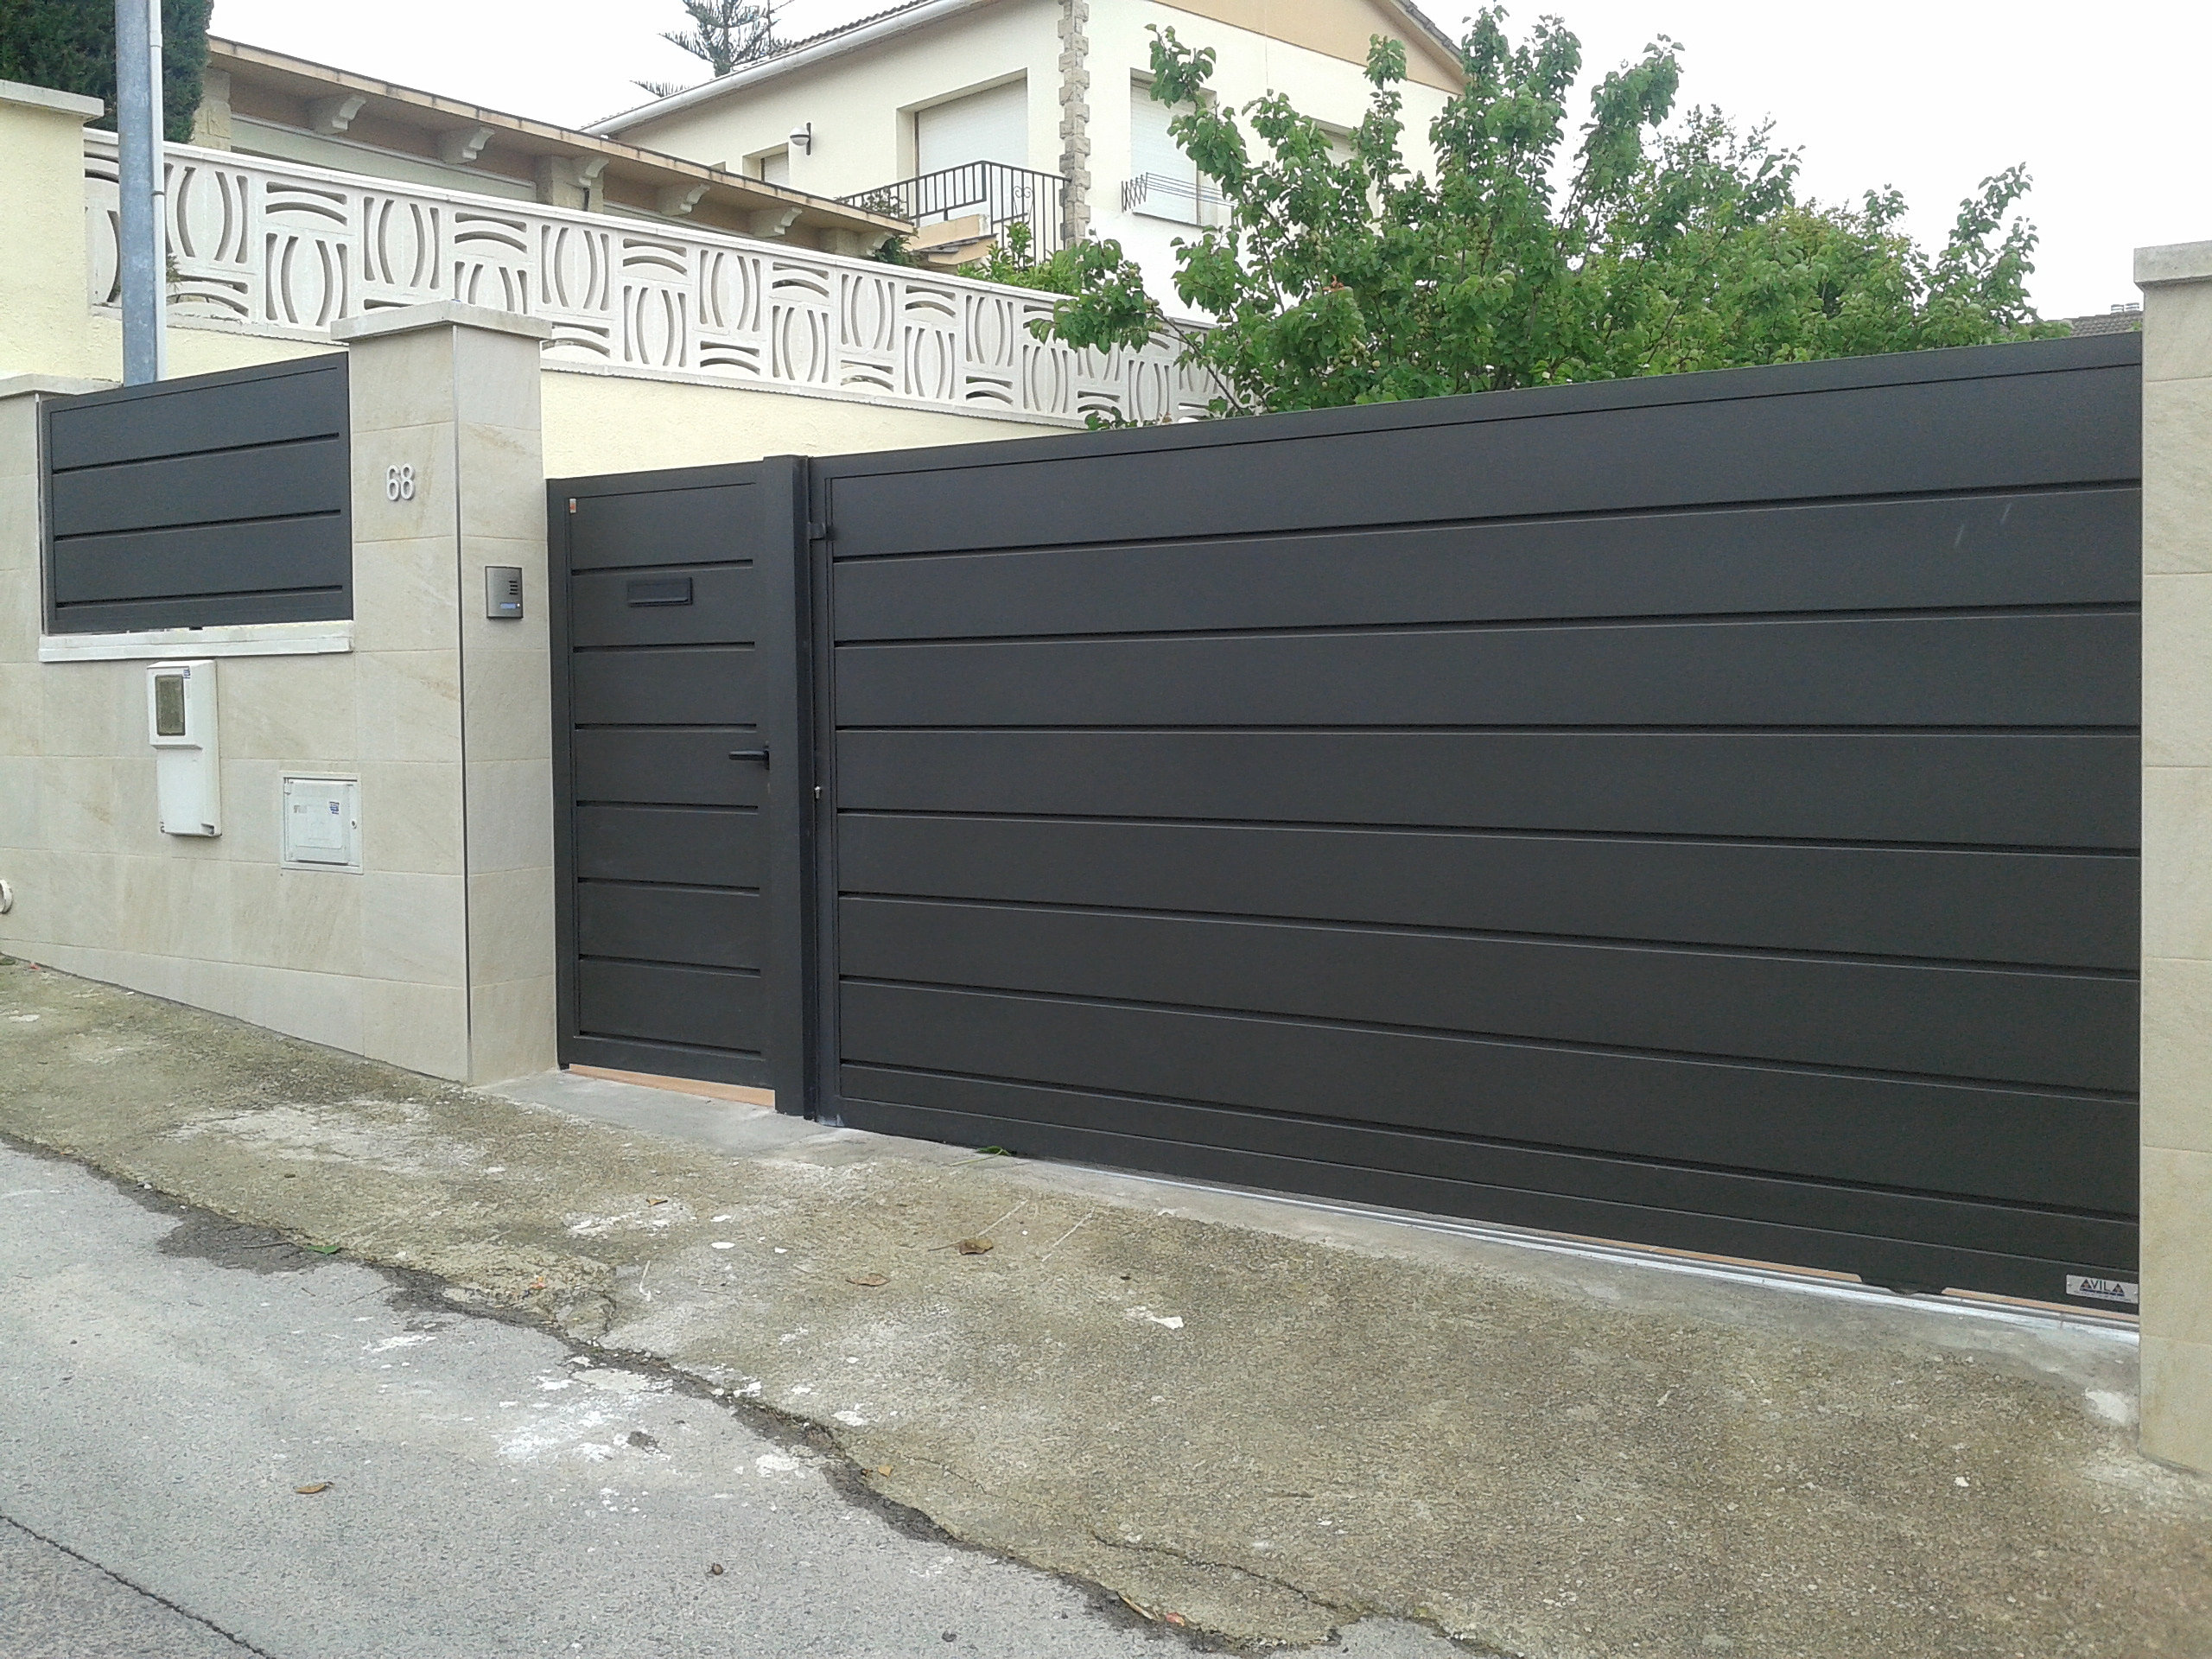 Puertas avila puerta corredera - Puerta corredera exterior ...